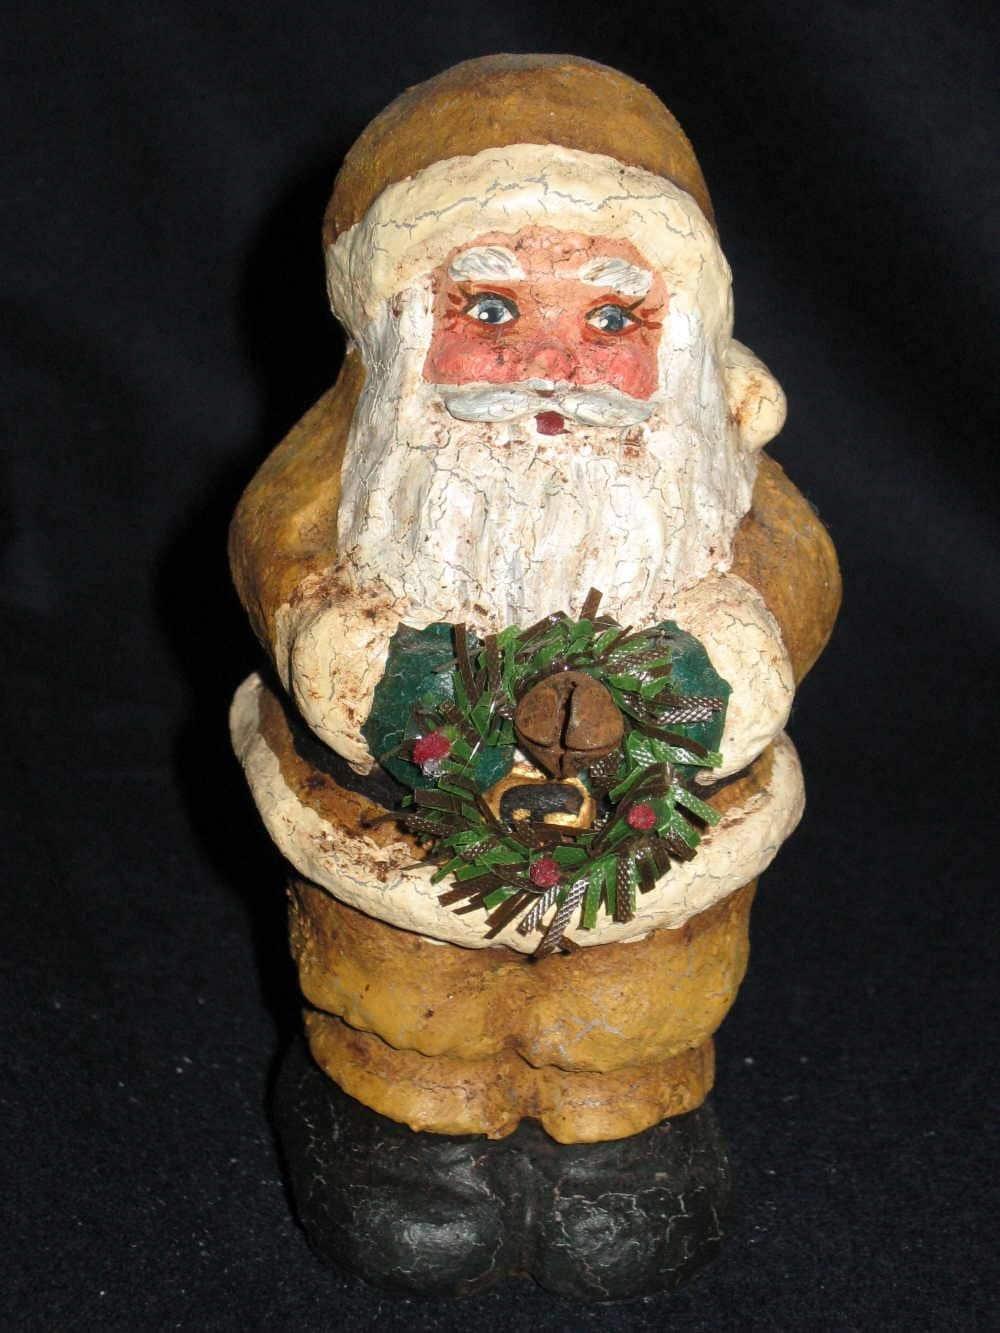 Paper mache Mustard Santa w/ Wreath